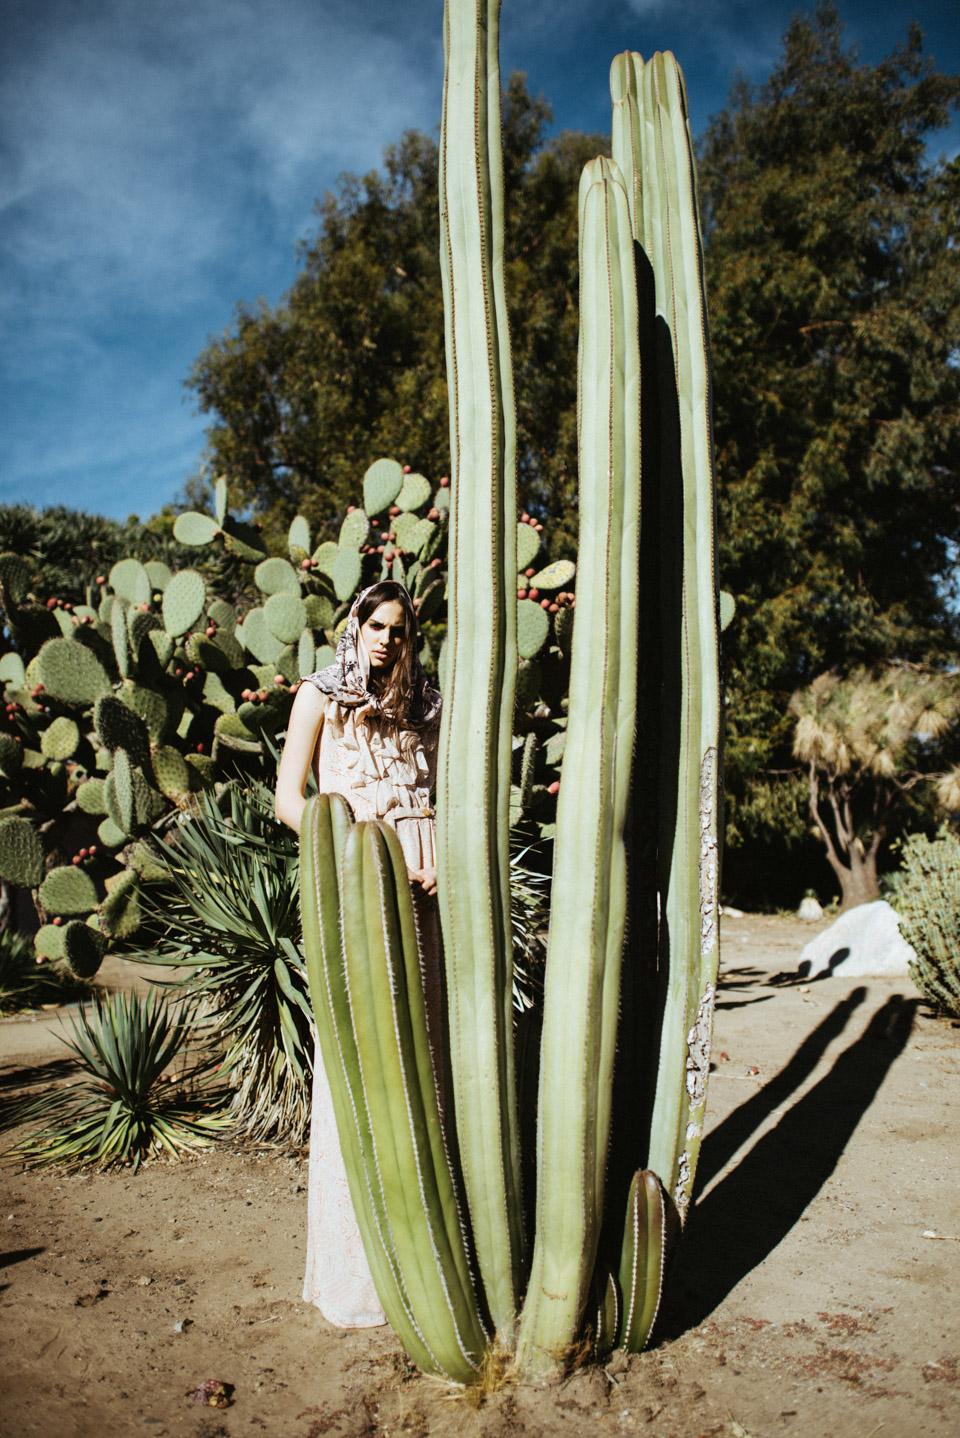 erika astrid fashion photographer and artist10.jpg